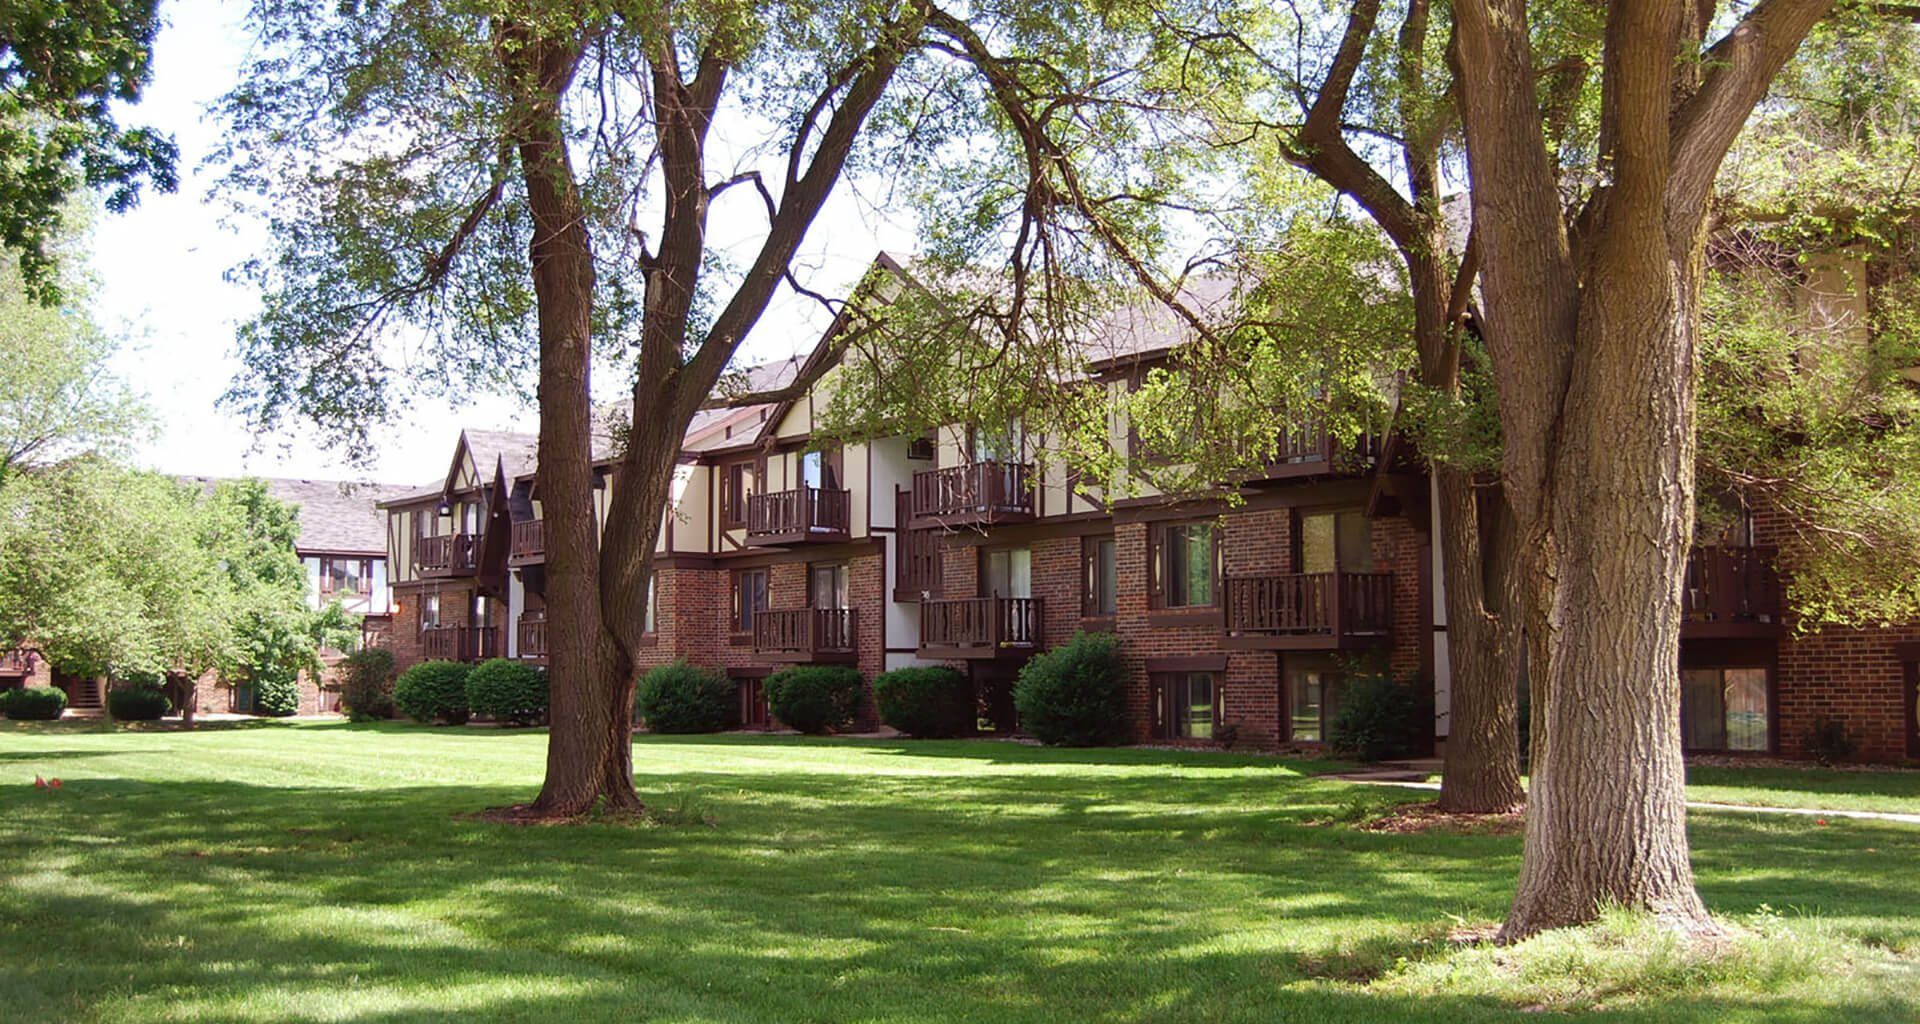 Park-Like Setting at Fairlane Apartments, Michigan